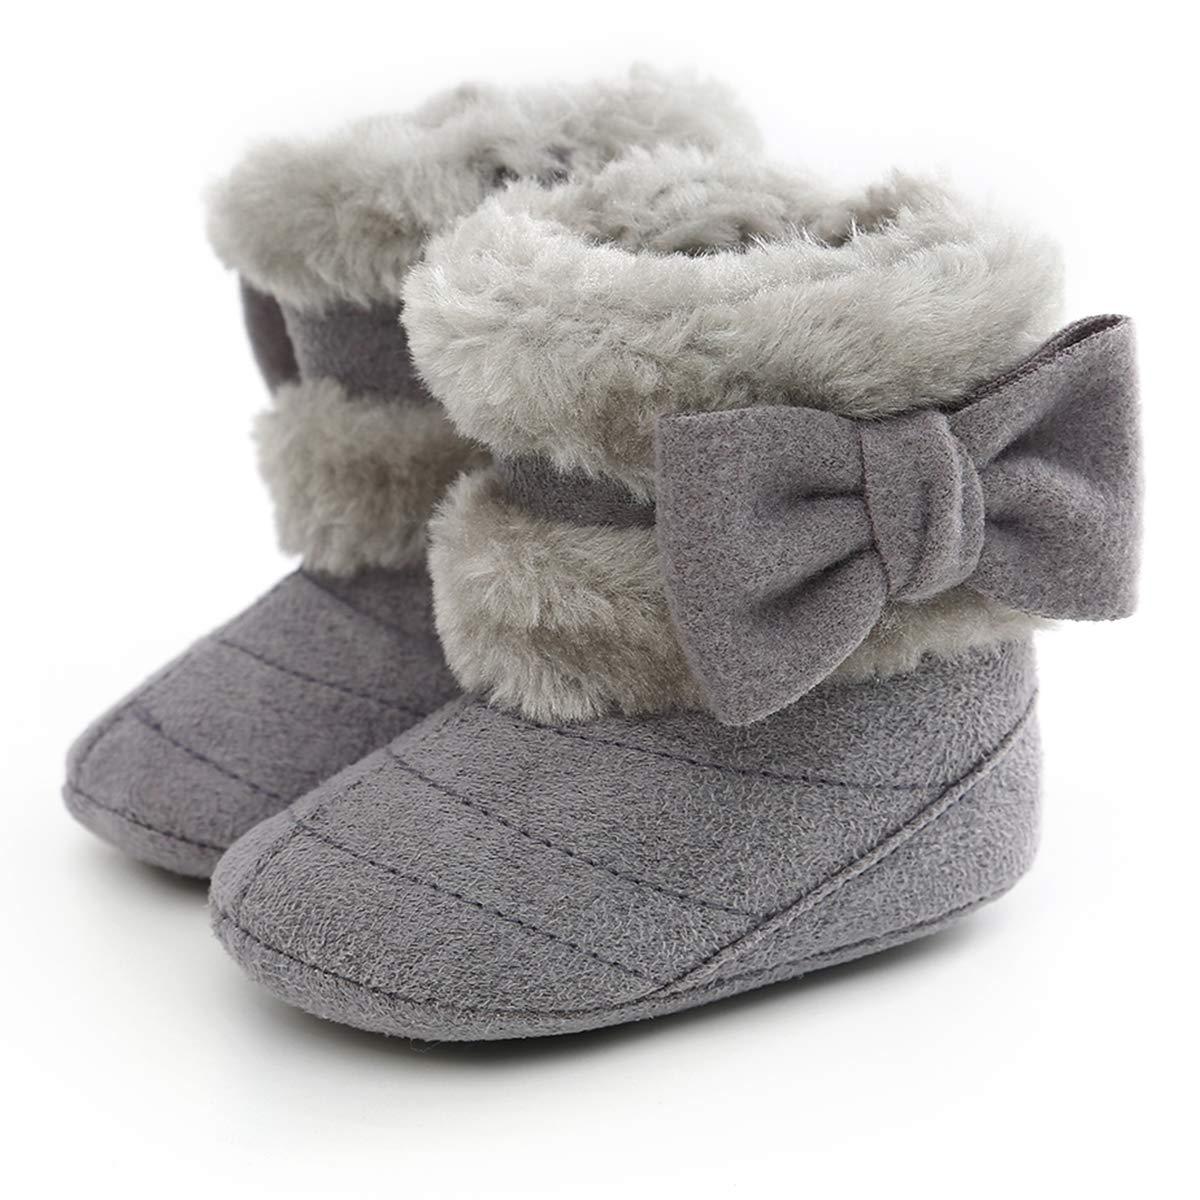 Yinuoday Winter Baby Girls Shoes Toddler Snow Boots Warm Prewalker Newborn Boots Anti-Slip